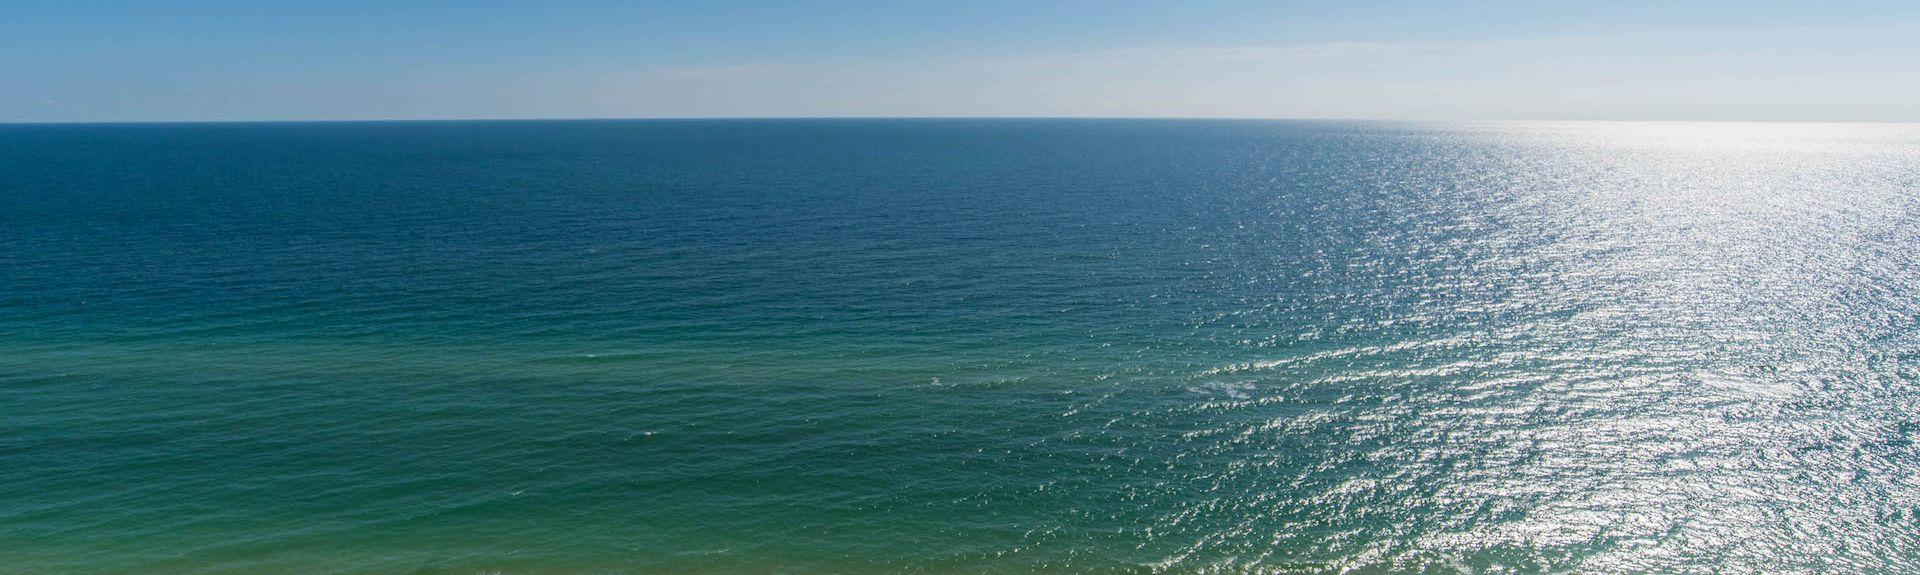 Phoenix Gulf Shores, Gulf Shores, Alabama, United States of America